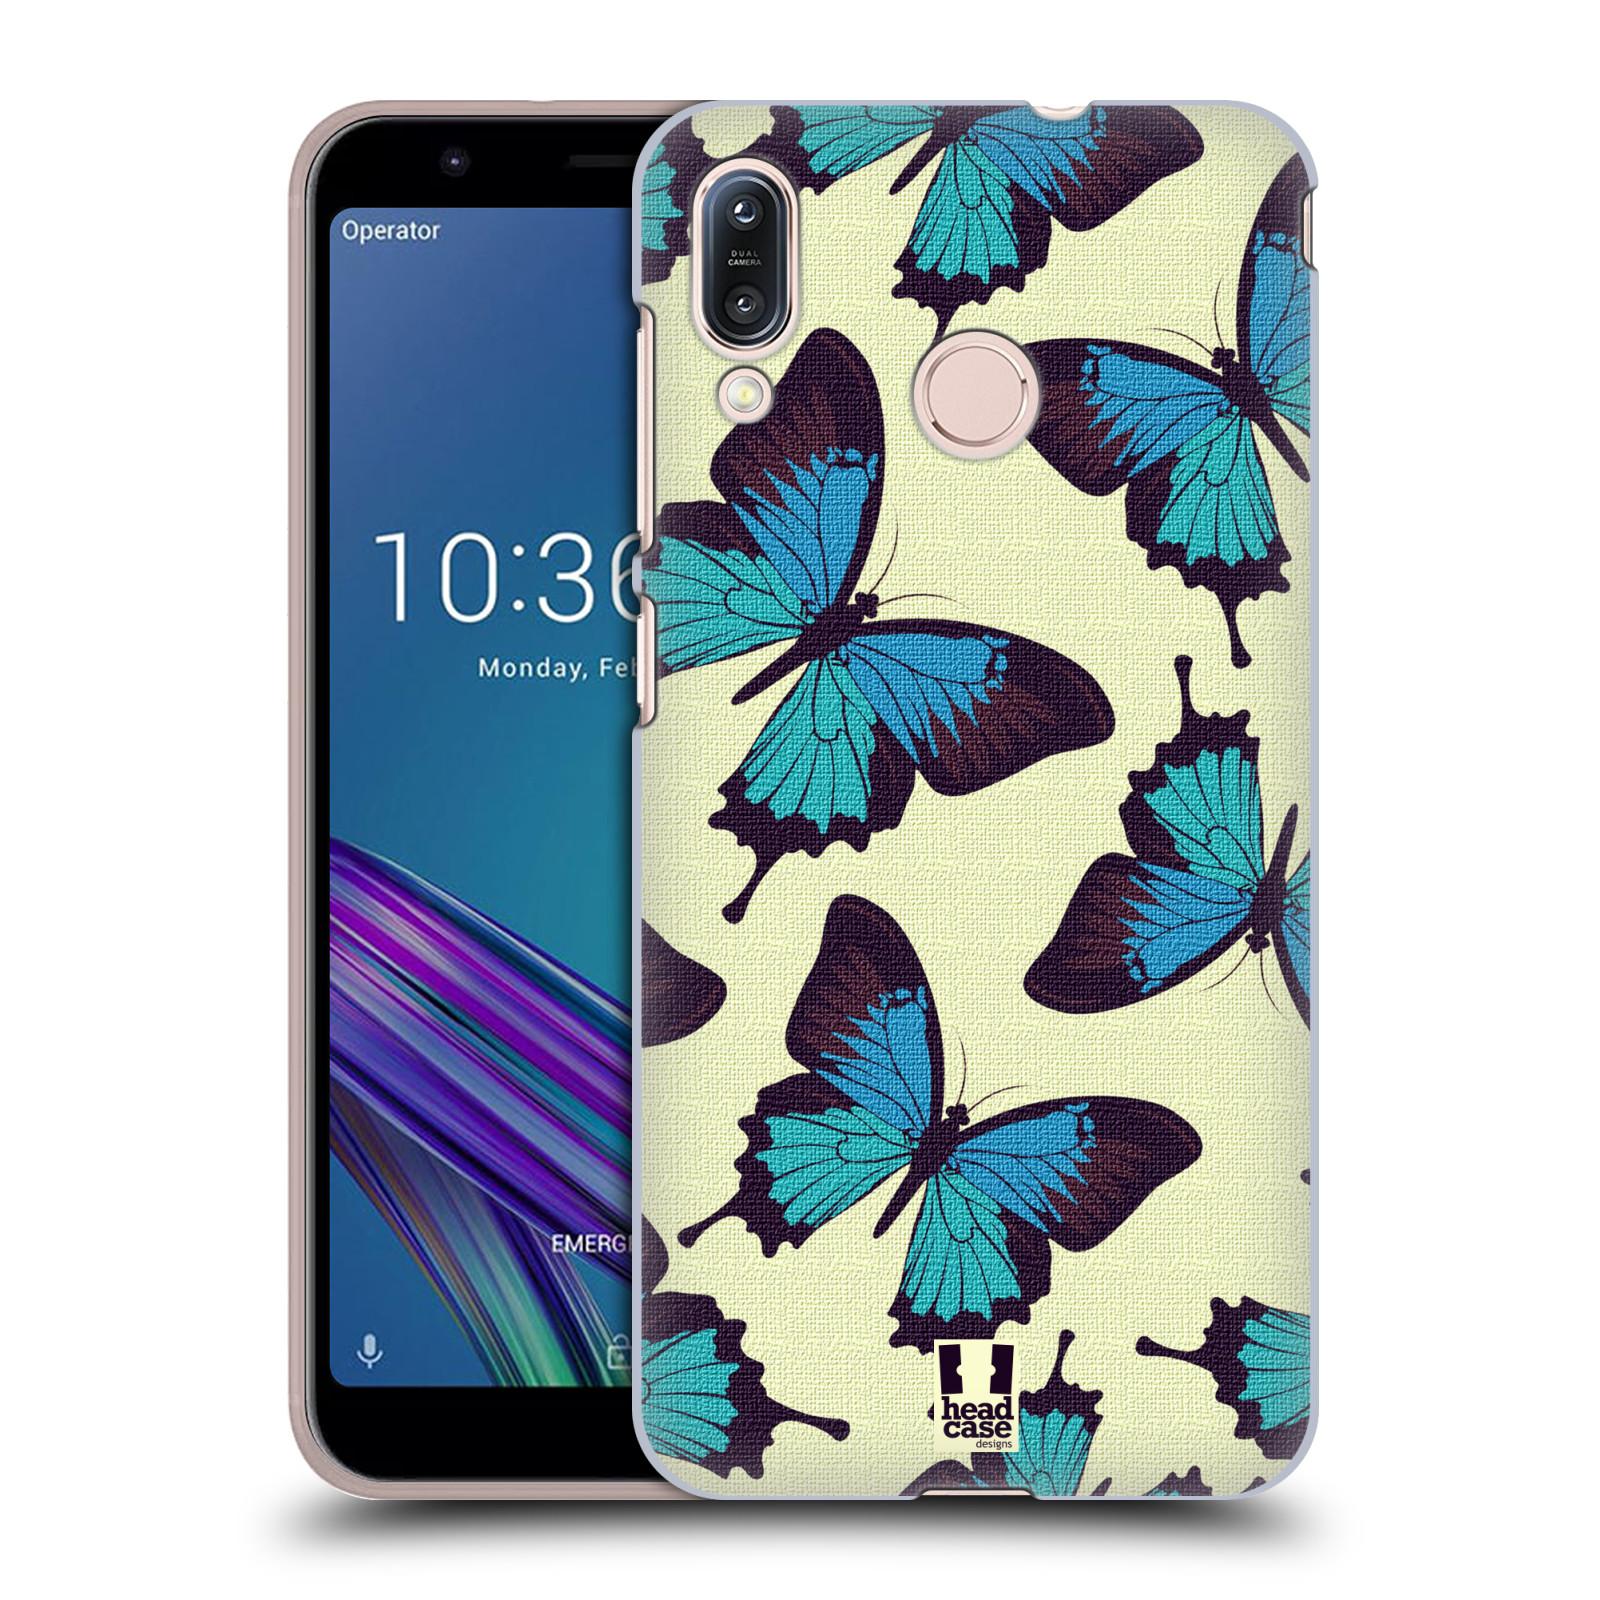 Pouzdro na mobil Asus Zenfone Max M1 (ZB555KL) - HEAD CASE - vzor Motýlci modrá